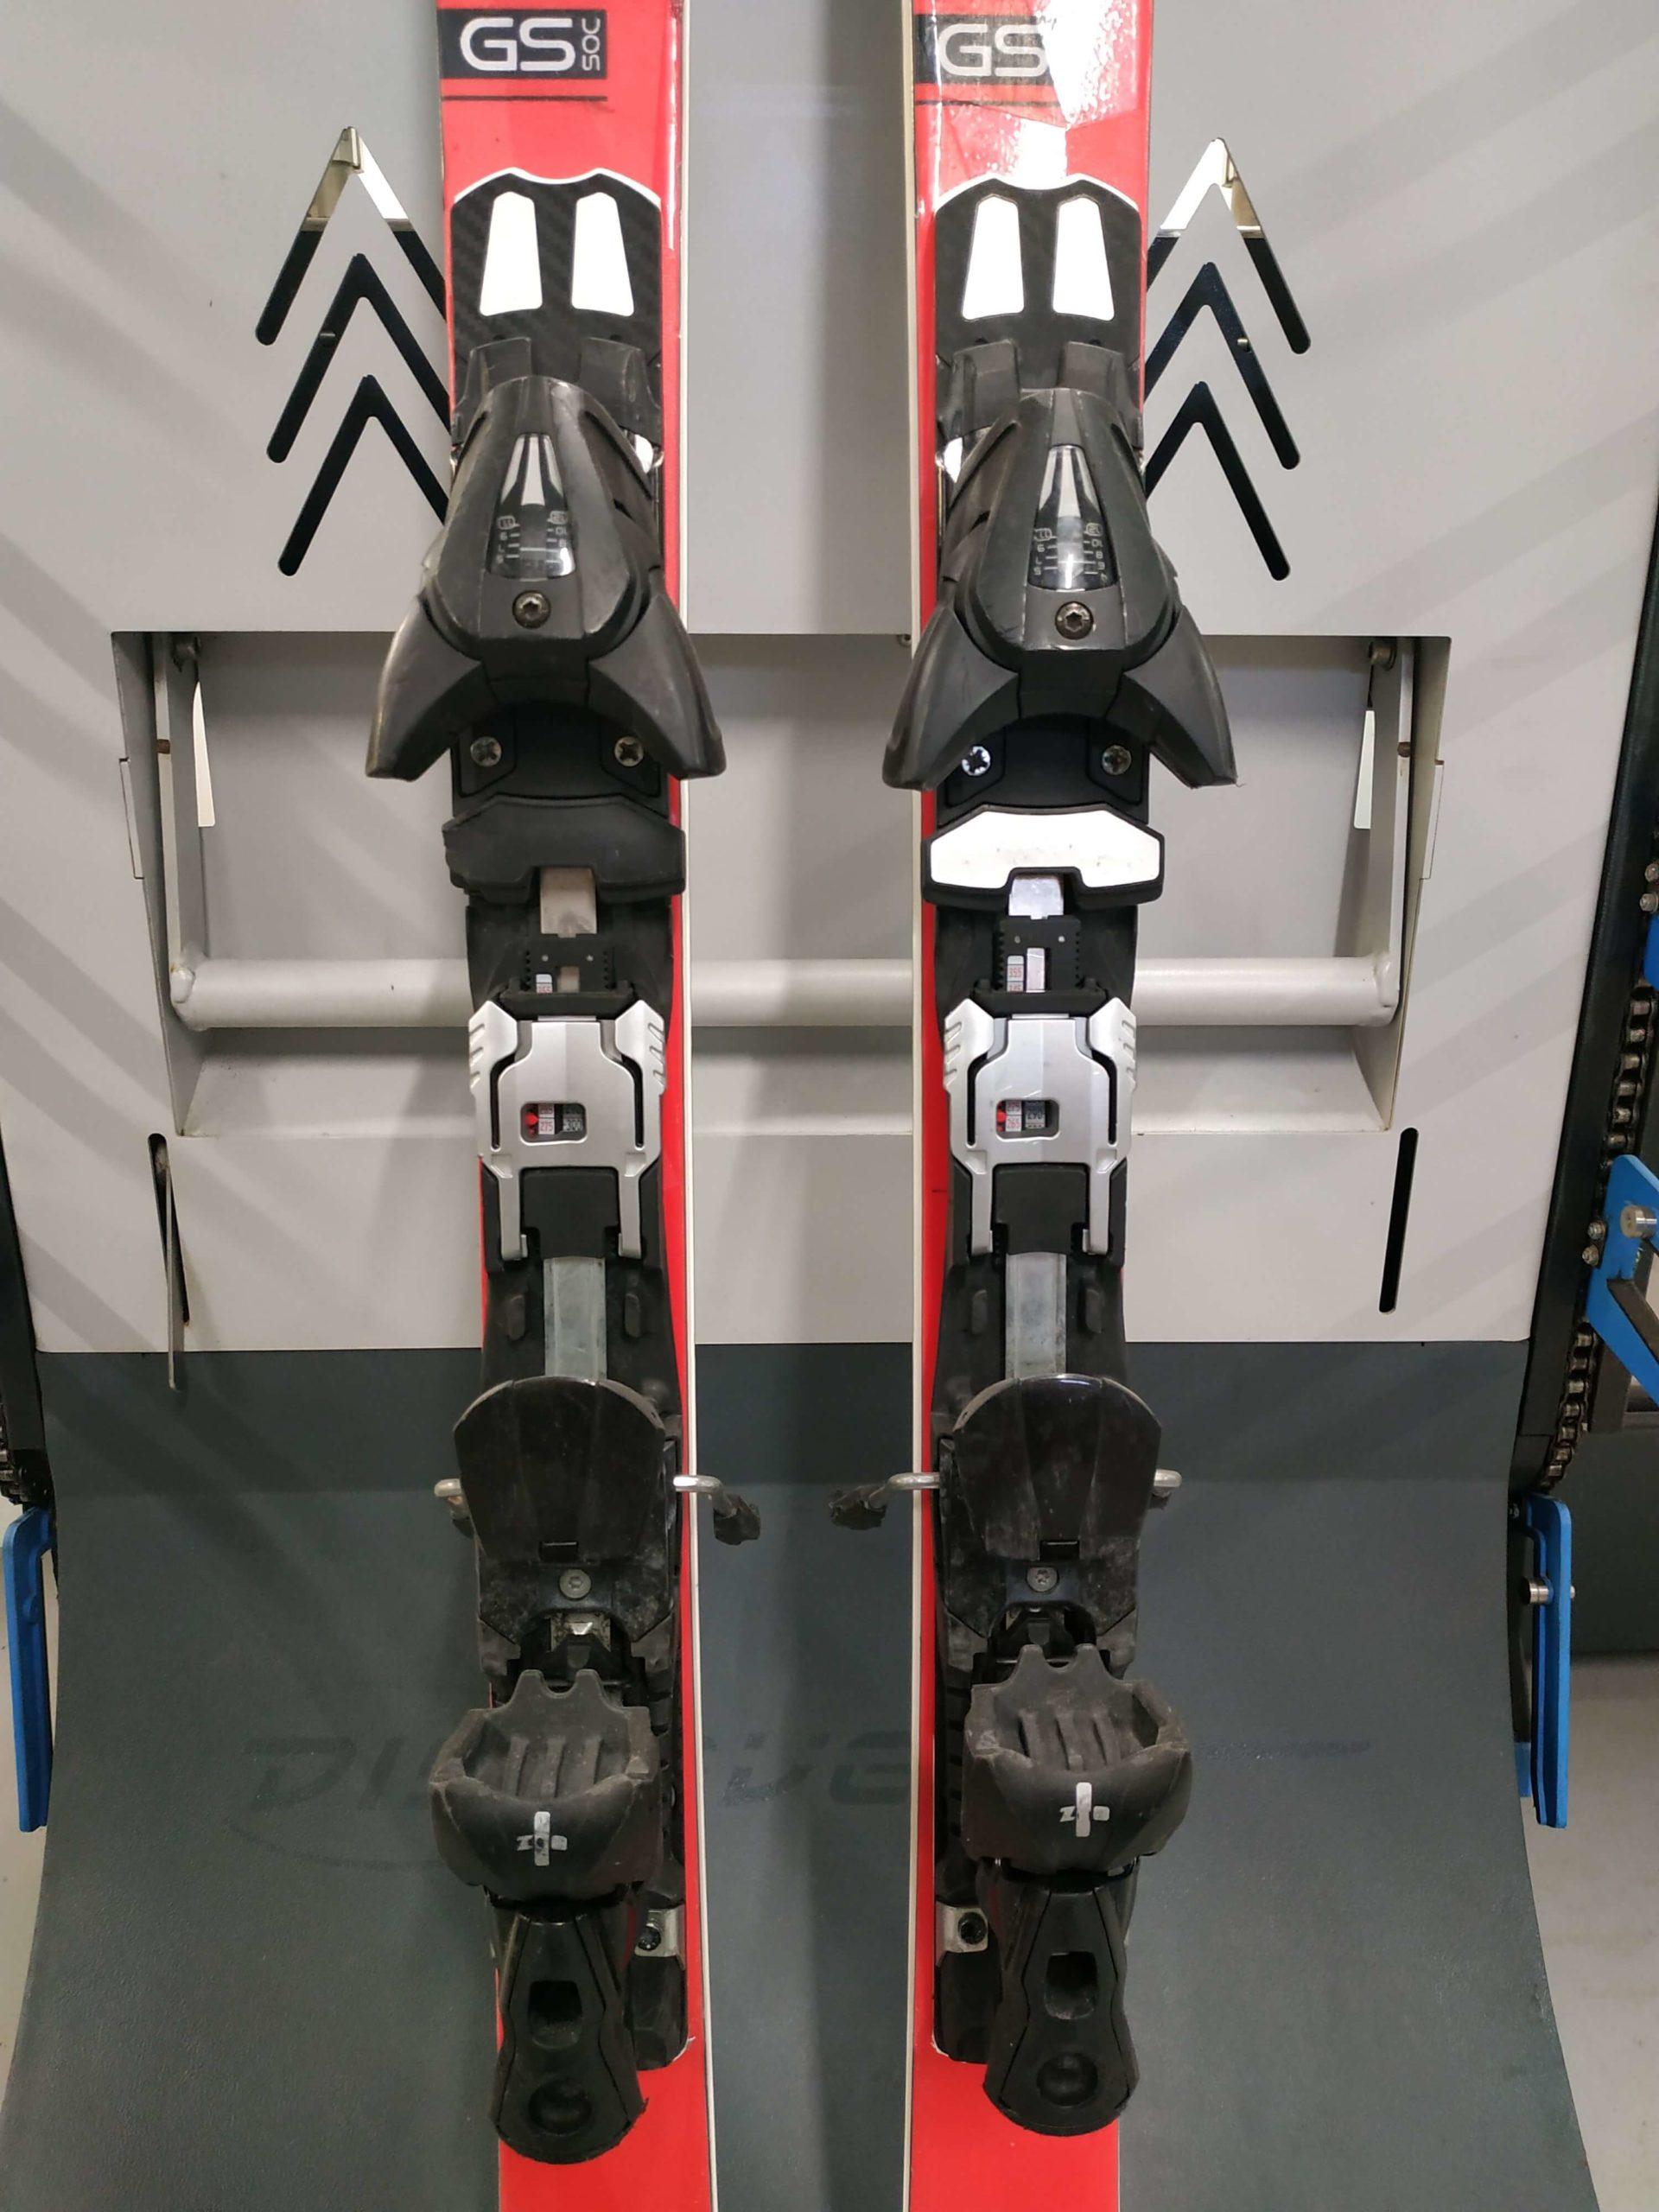 3. Stockli GS Laser VRT 170 R16.1 (3)